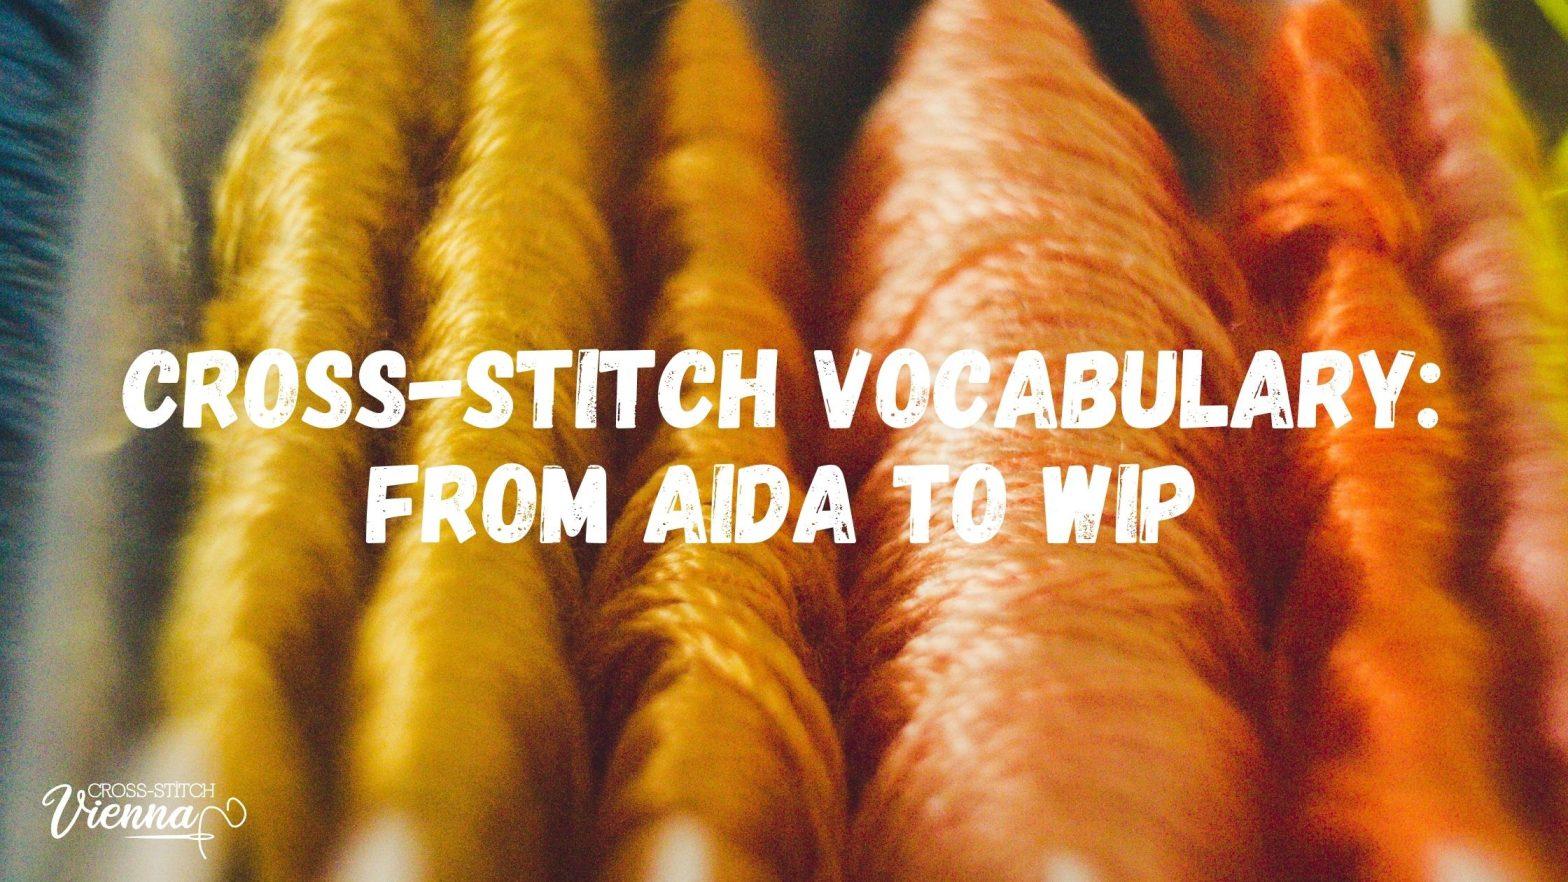 Cross-Stitch Vocabulary From Aida to WIP